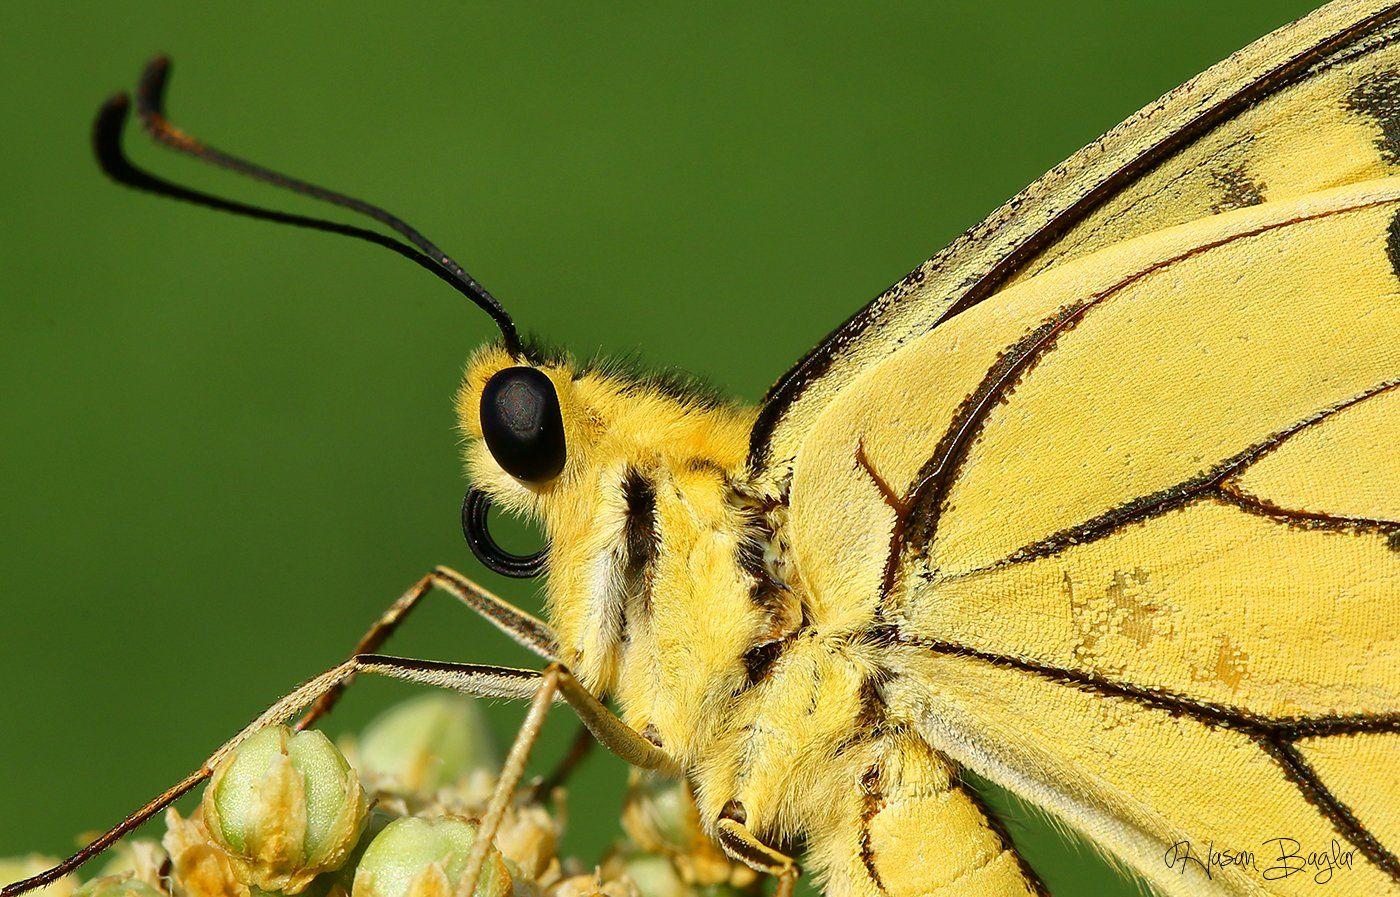 #swallowtail#butterfly#macro#nature#northcyprus, Hasan Baglar